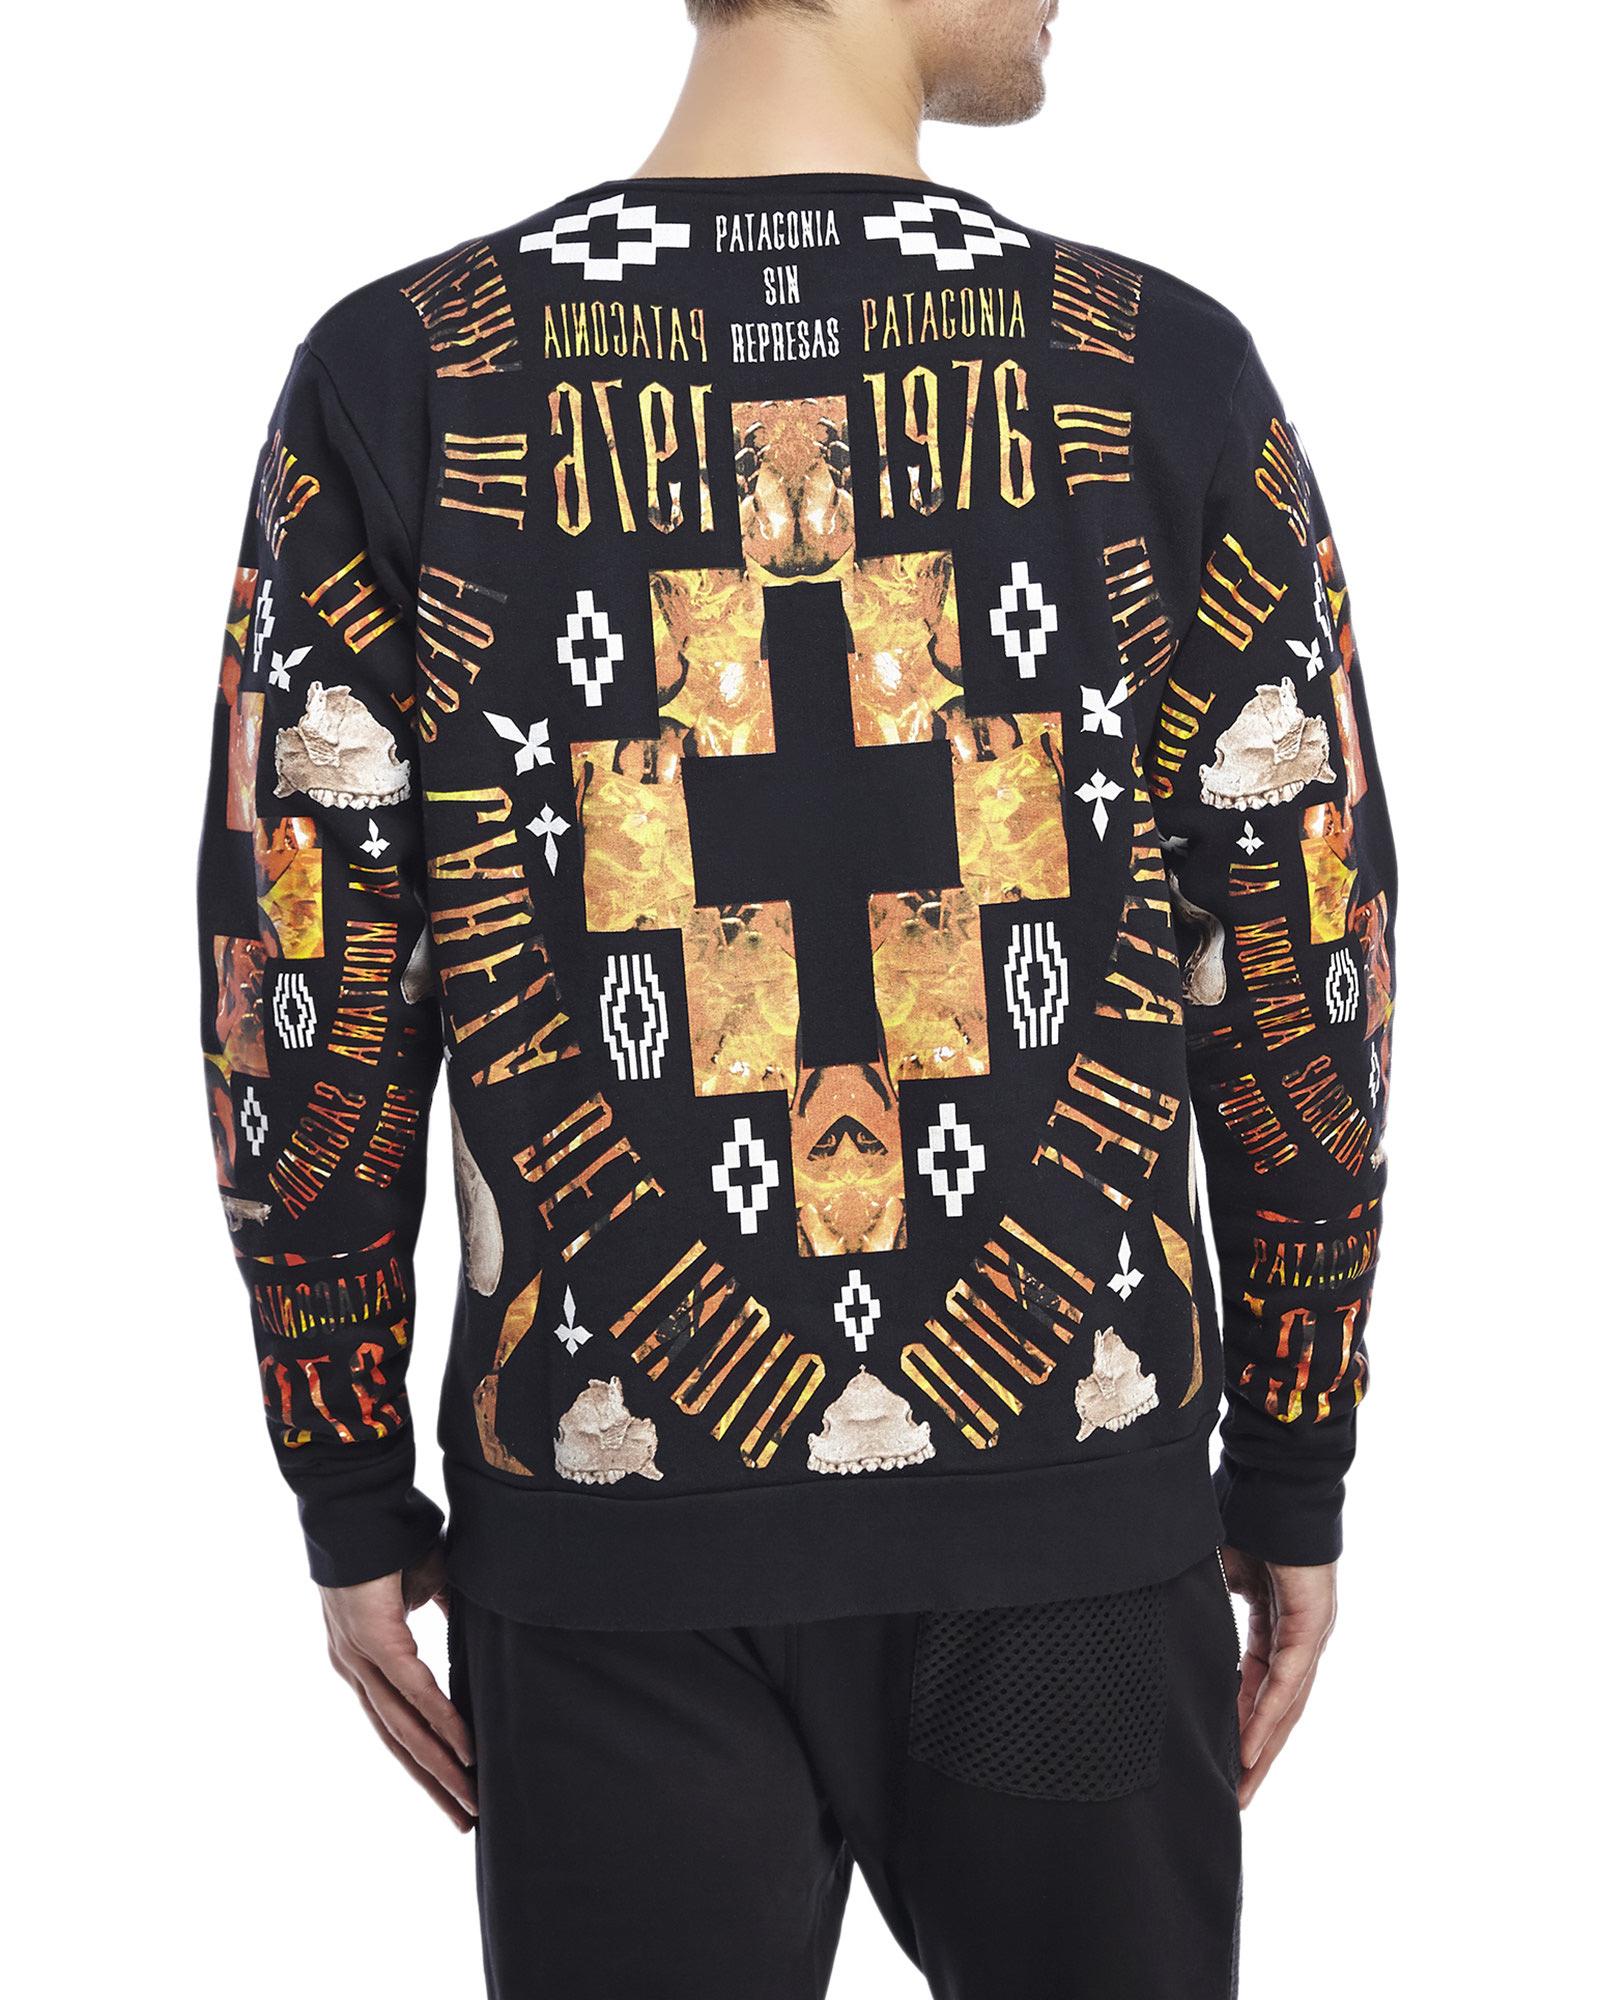 b4cd9b6d5 Best Sweatshirts Amazon - BCD Tofu House